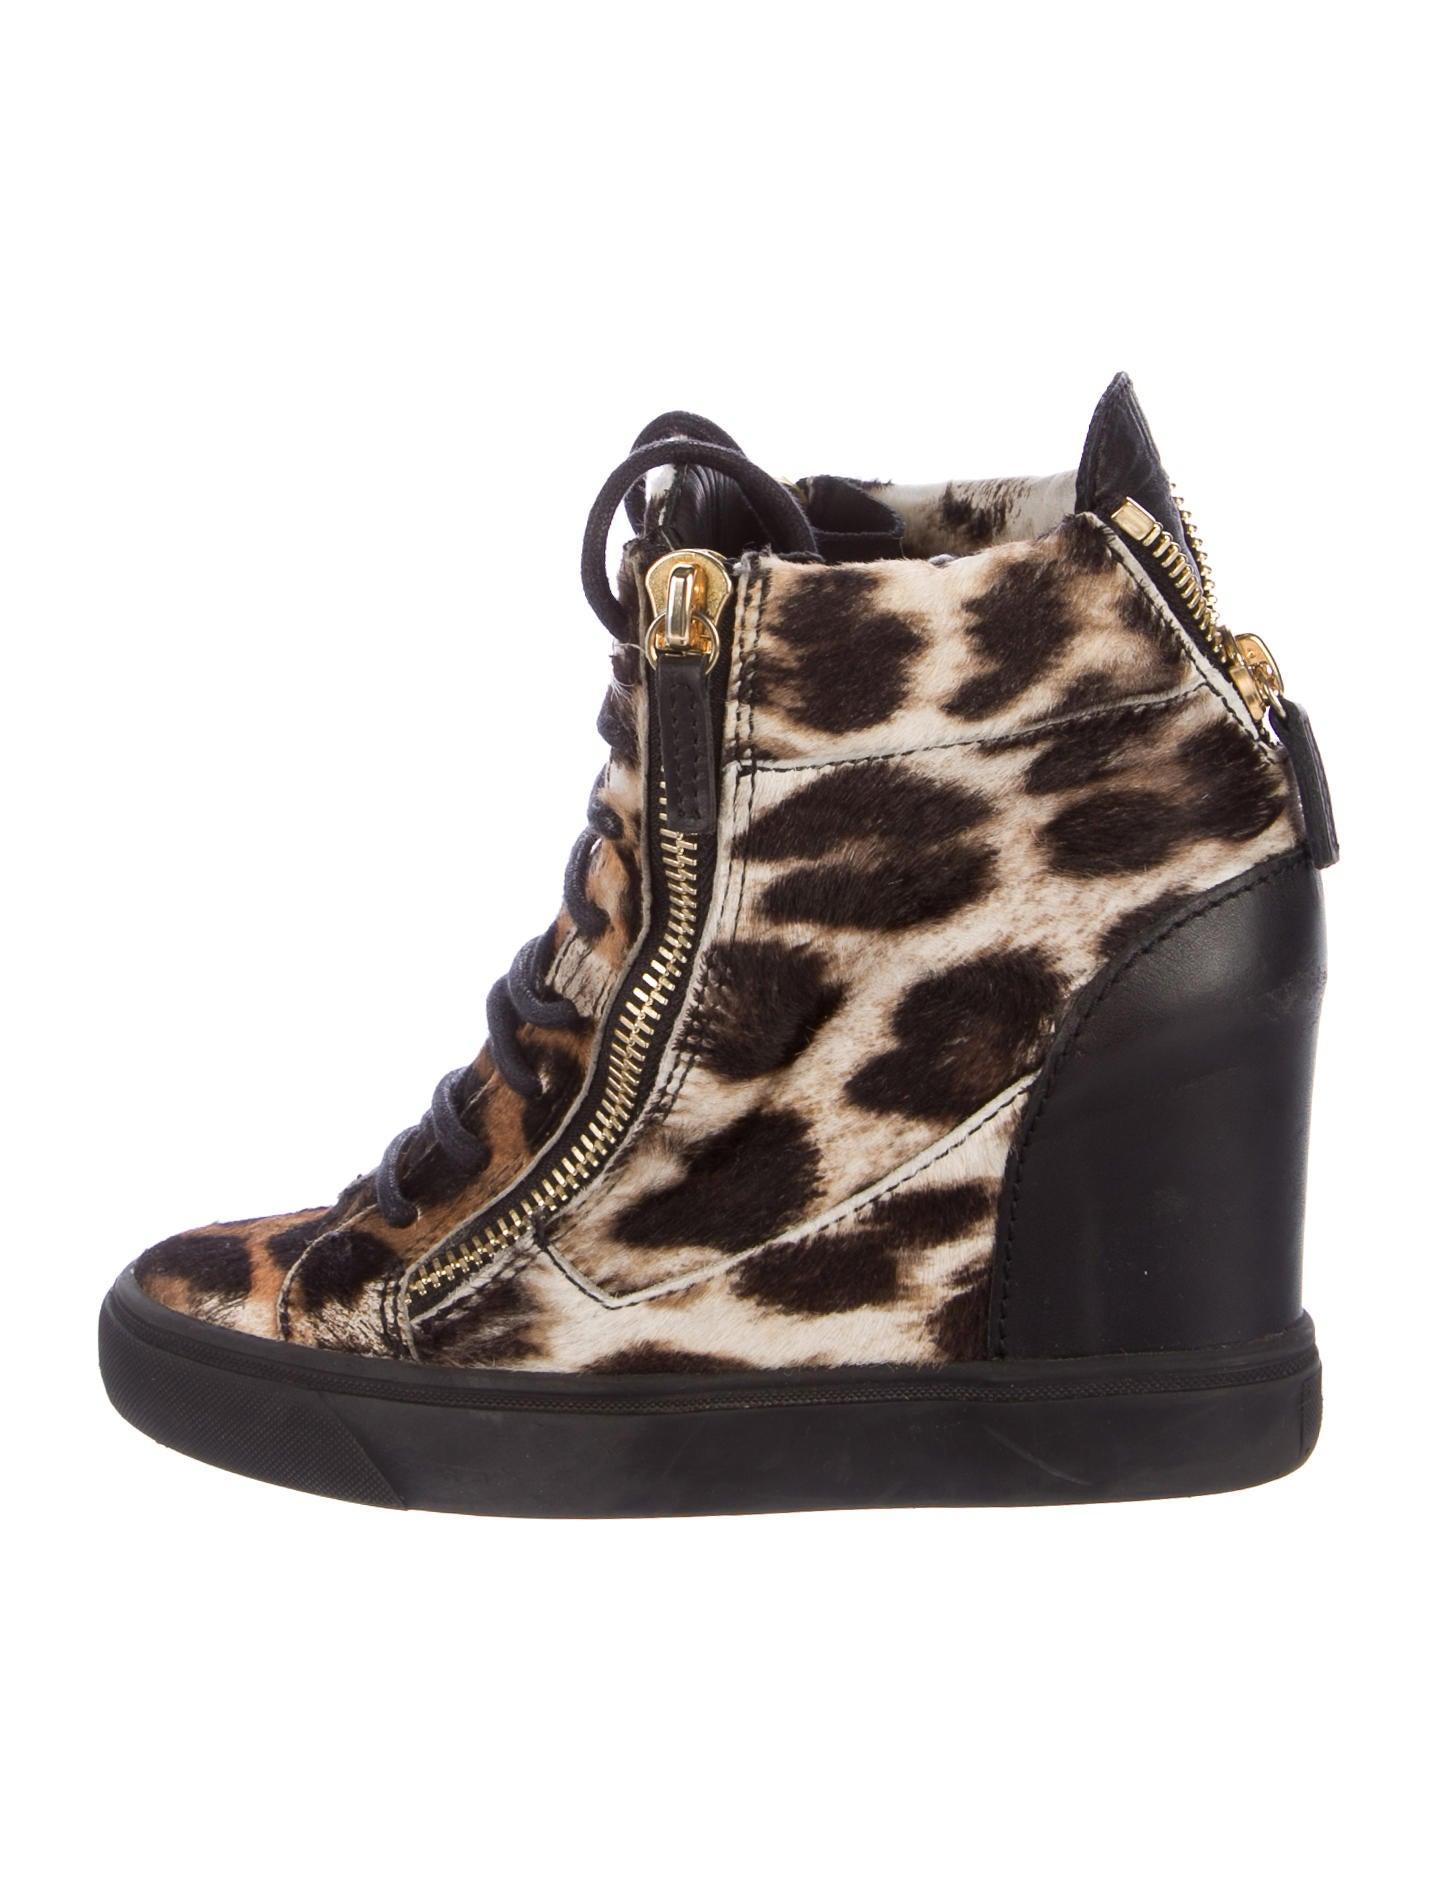 8a3d385d75330 Giuseppe Zanotti Women's Shoes Sale Brand Of Shoes | Portal for Tenders